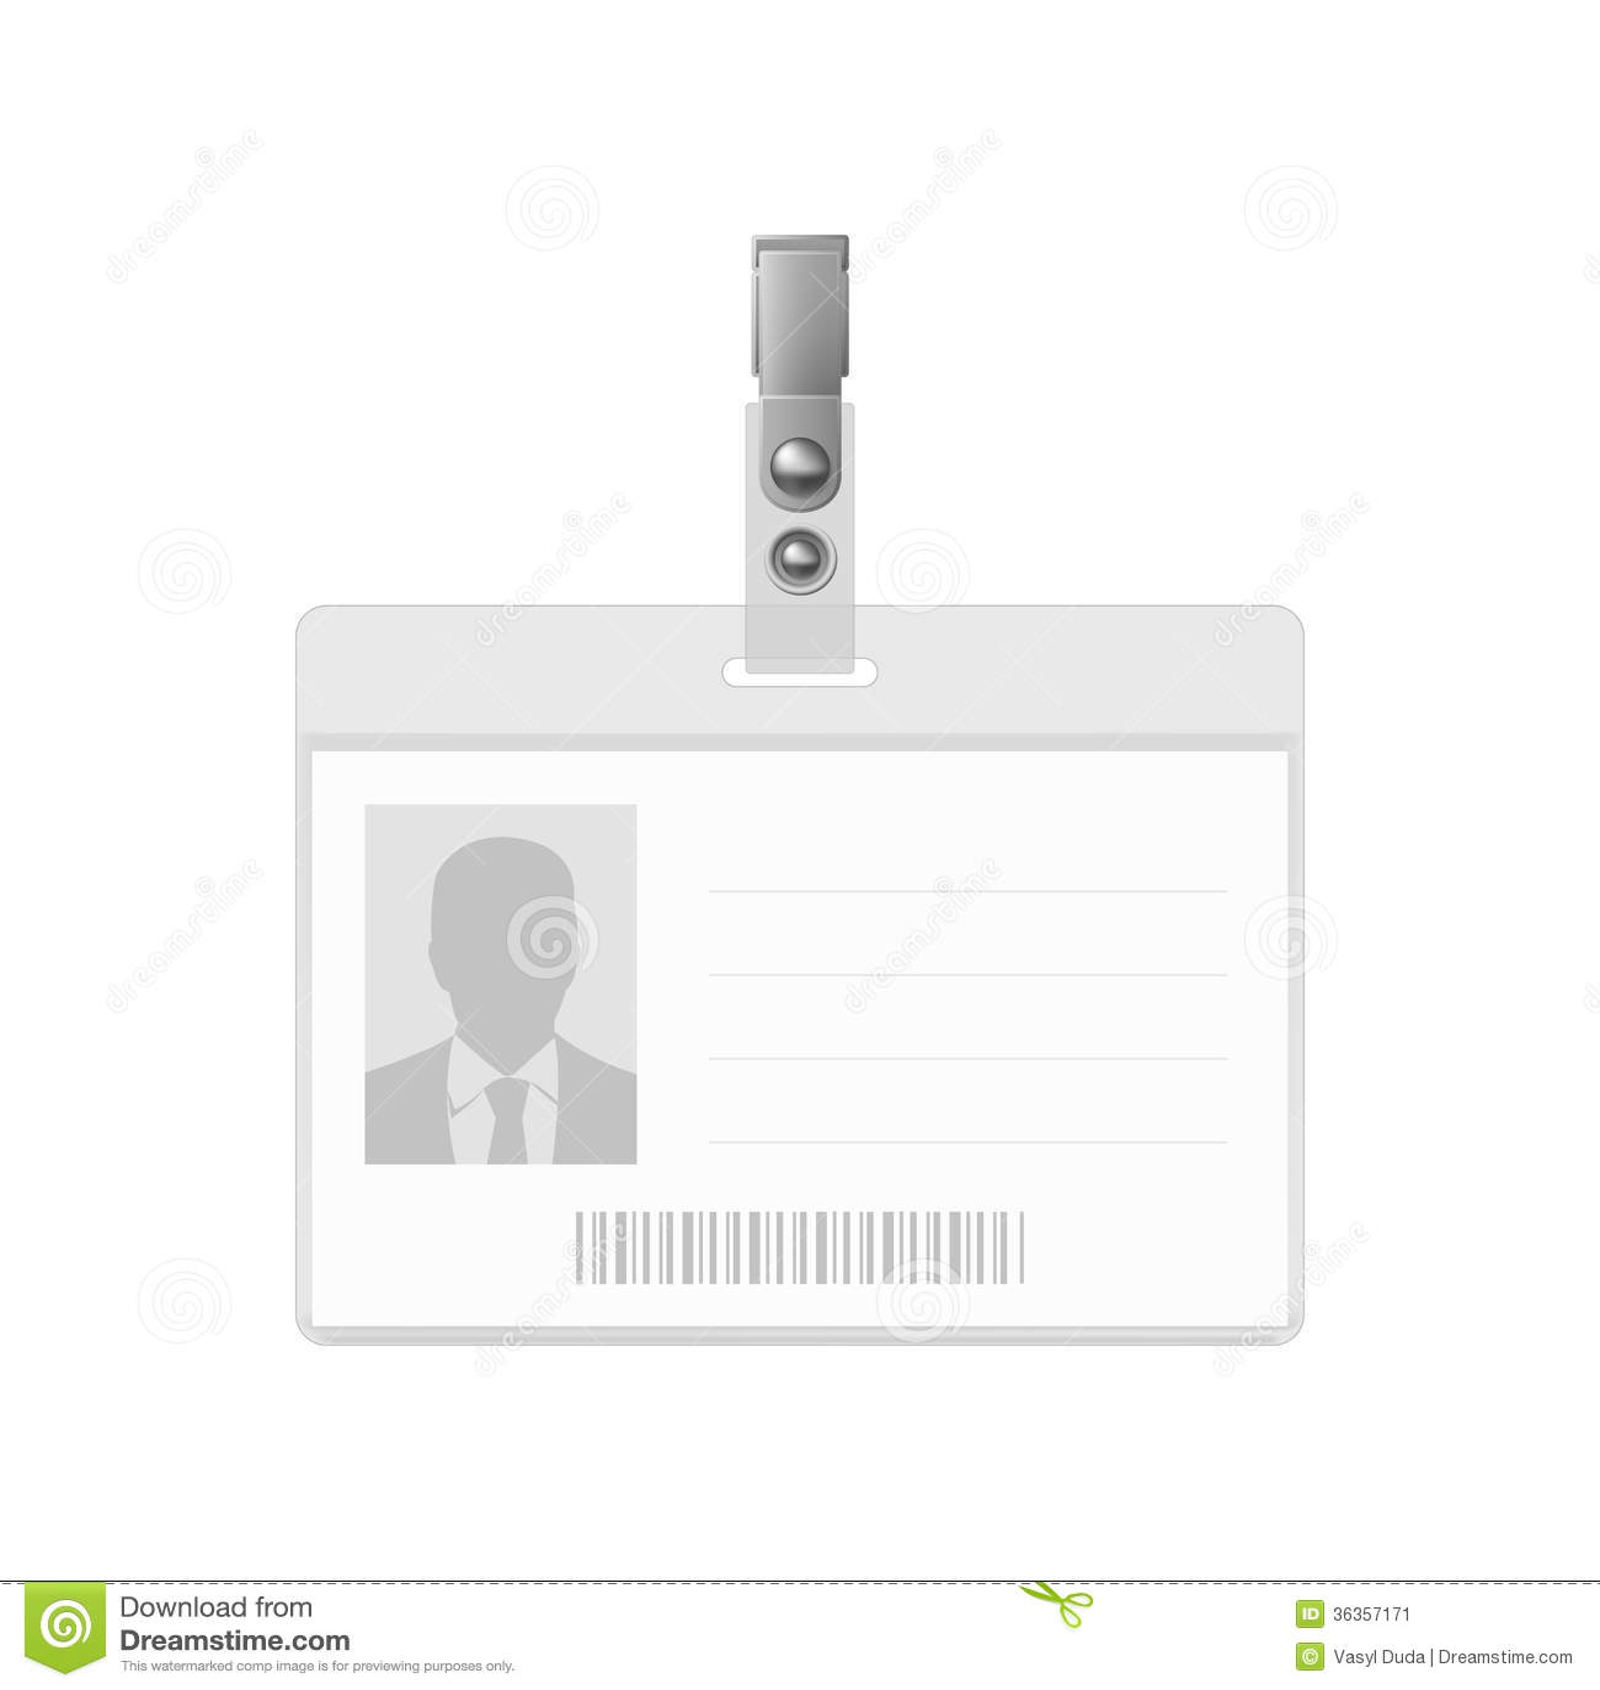 blank badge  stock image